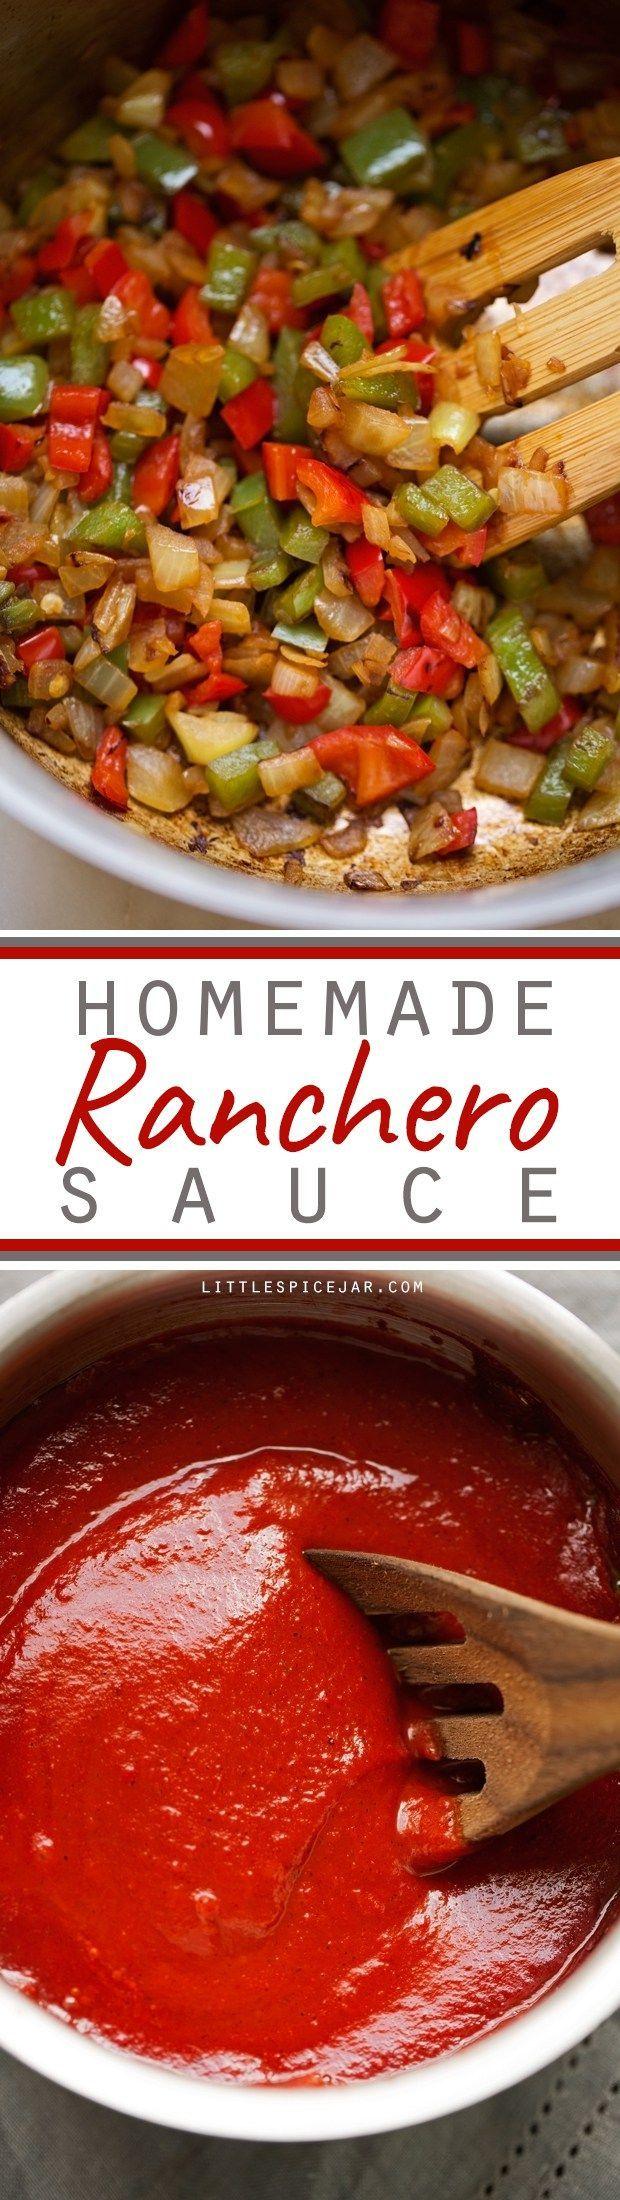 Ranchero Sauce - A simple recipe to make homemade ranchero sauce! This sauce is amazing on huevos rancheros, to dip your breakfast tacos in, or to use as enchilada sauce in casseroles! #rancherosauce #huevosrancheros #tacosauce | Littlespicejar.com